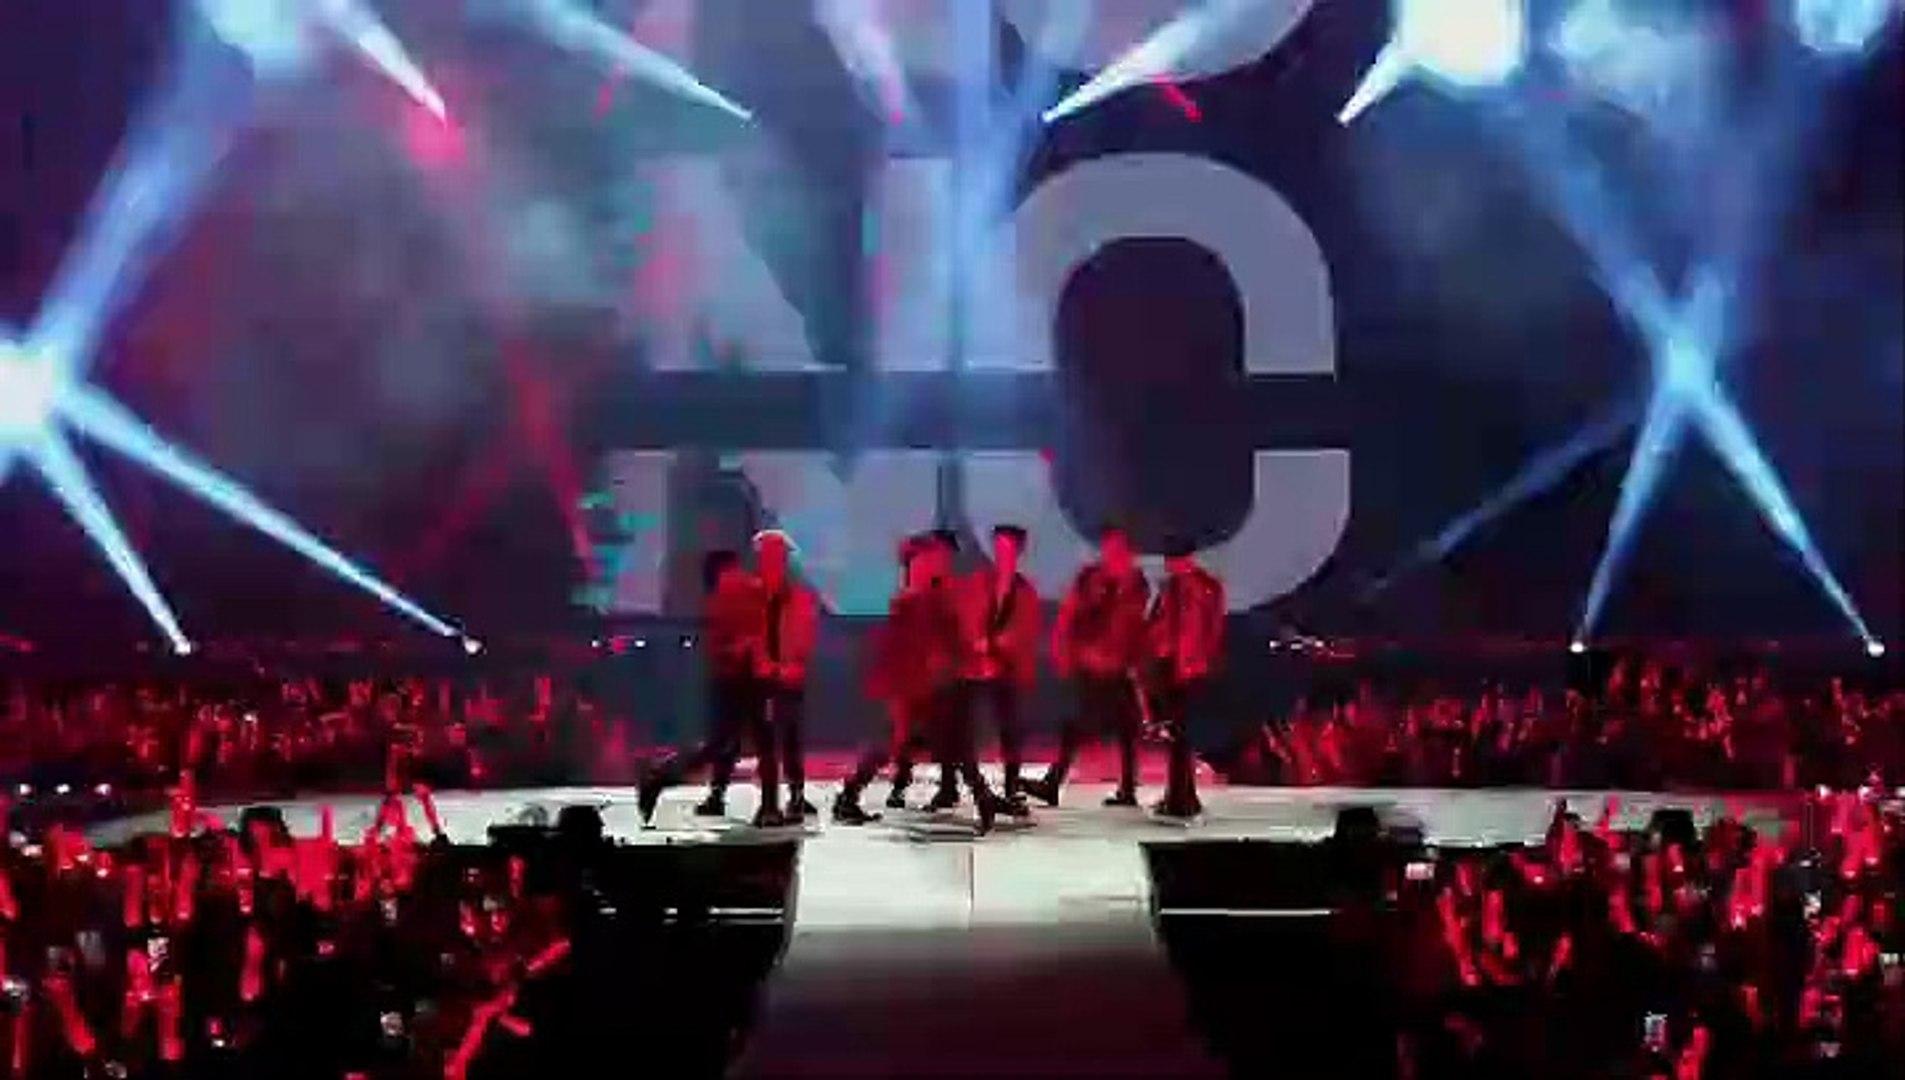 [Engsub] iKON Continue Tour in Seoul DVD part 1